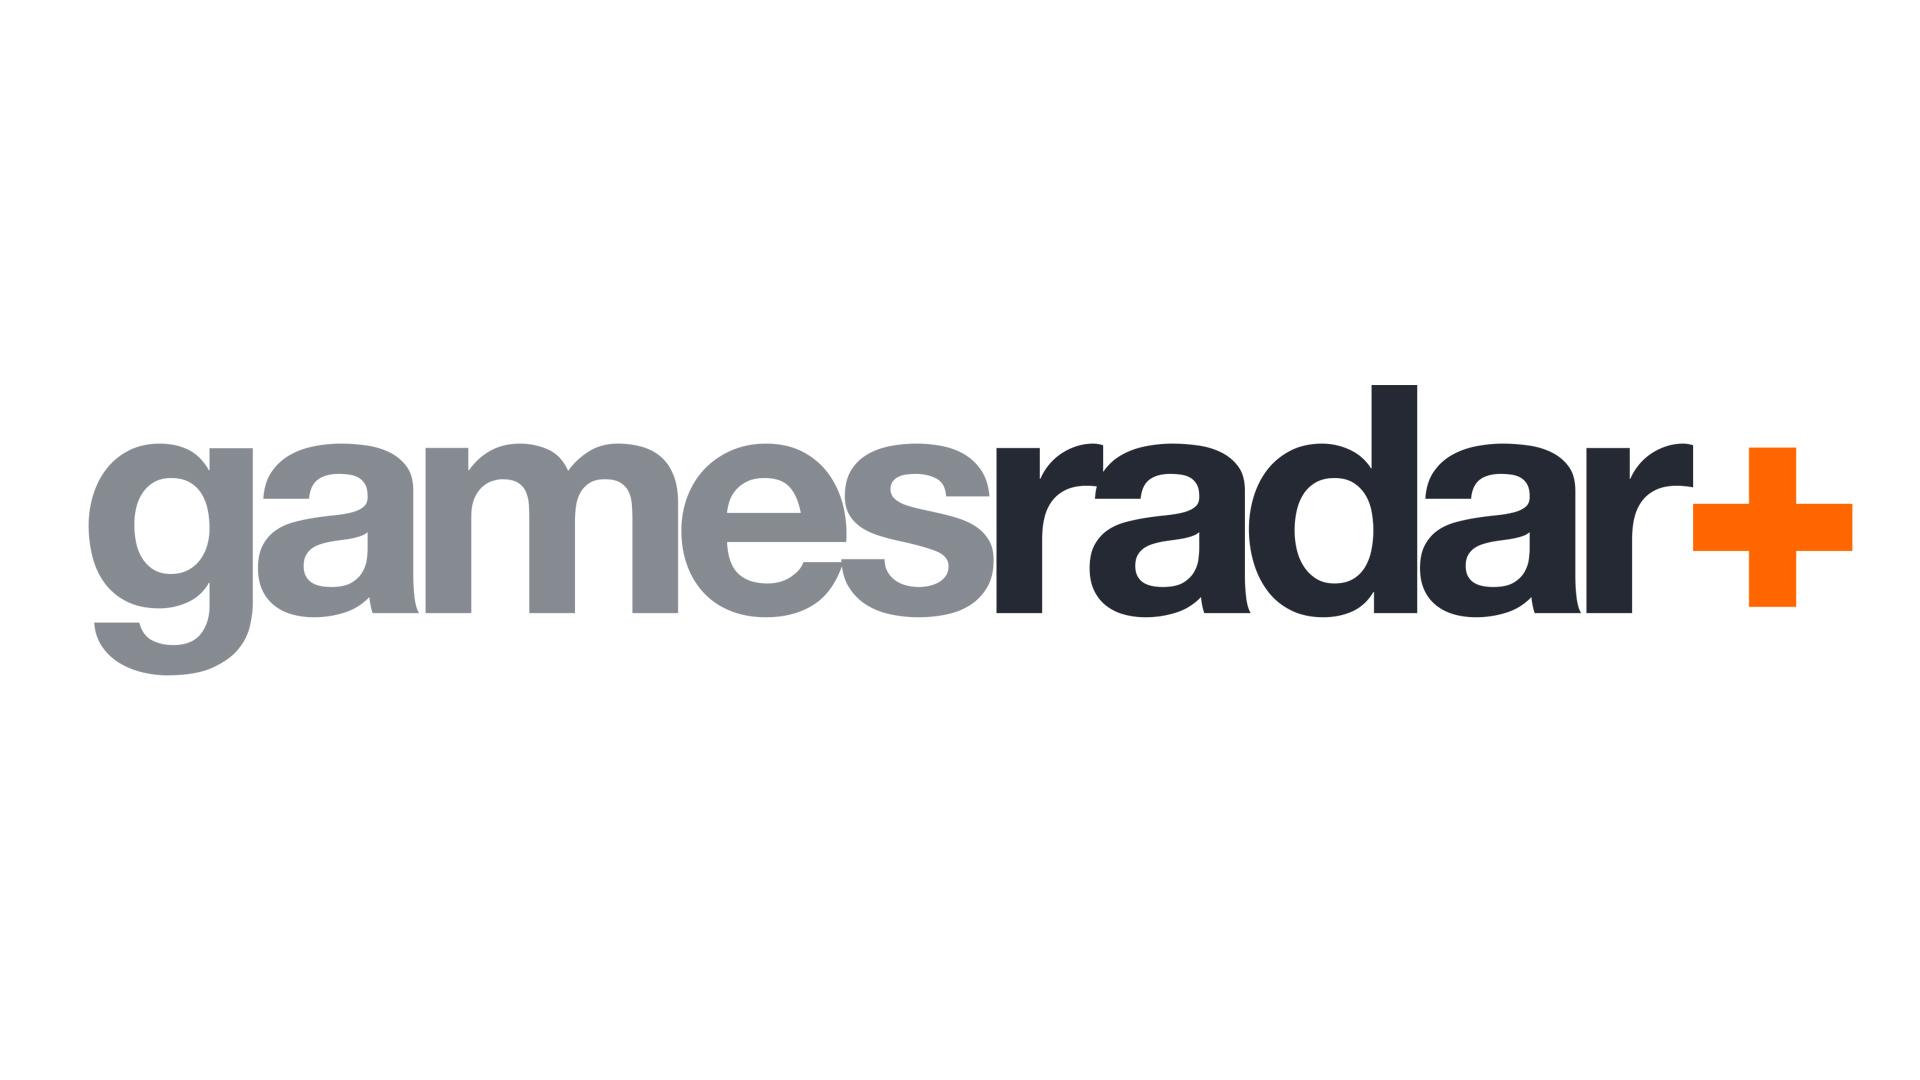 About Us - Who's on the GamesRadar+ team? | GamesRadar+